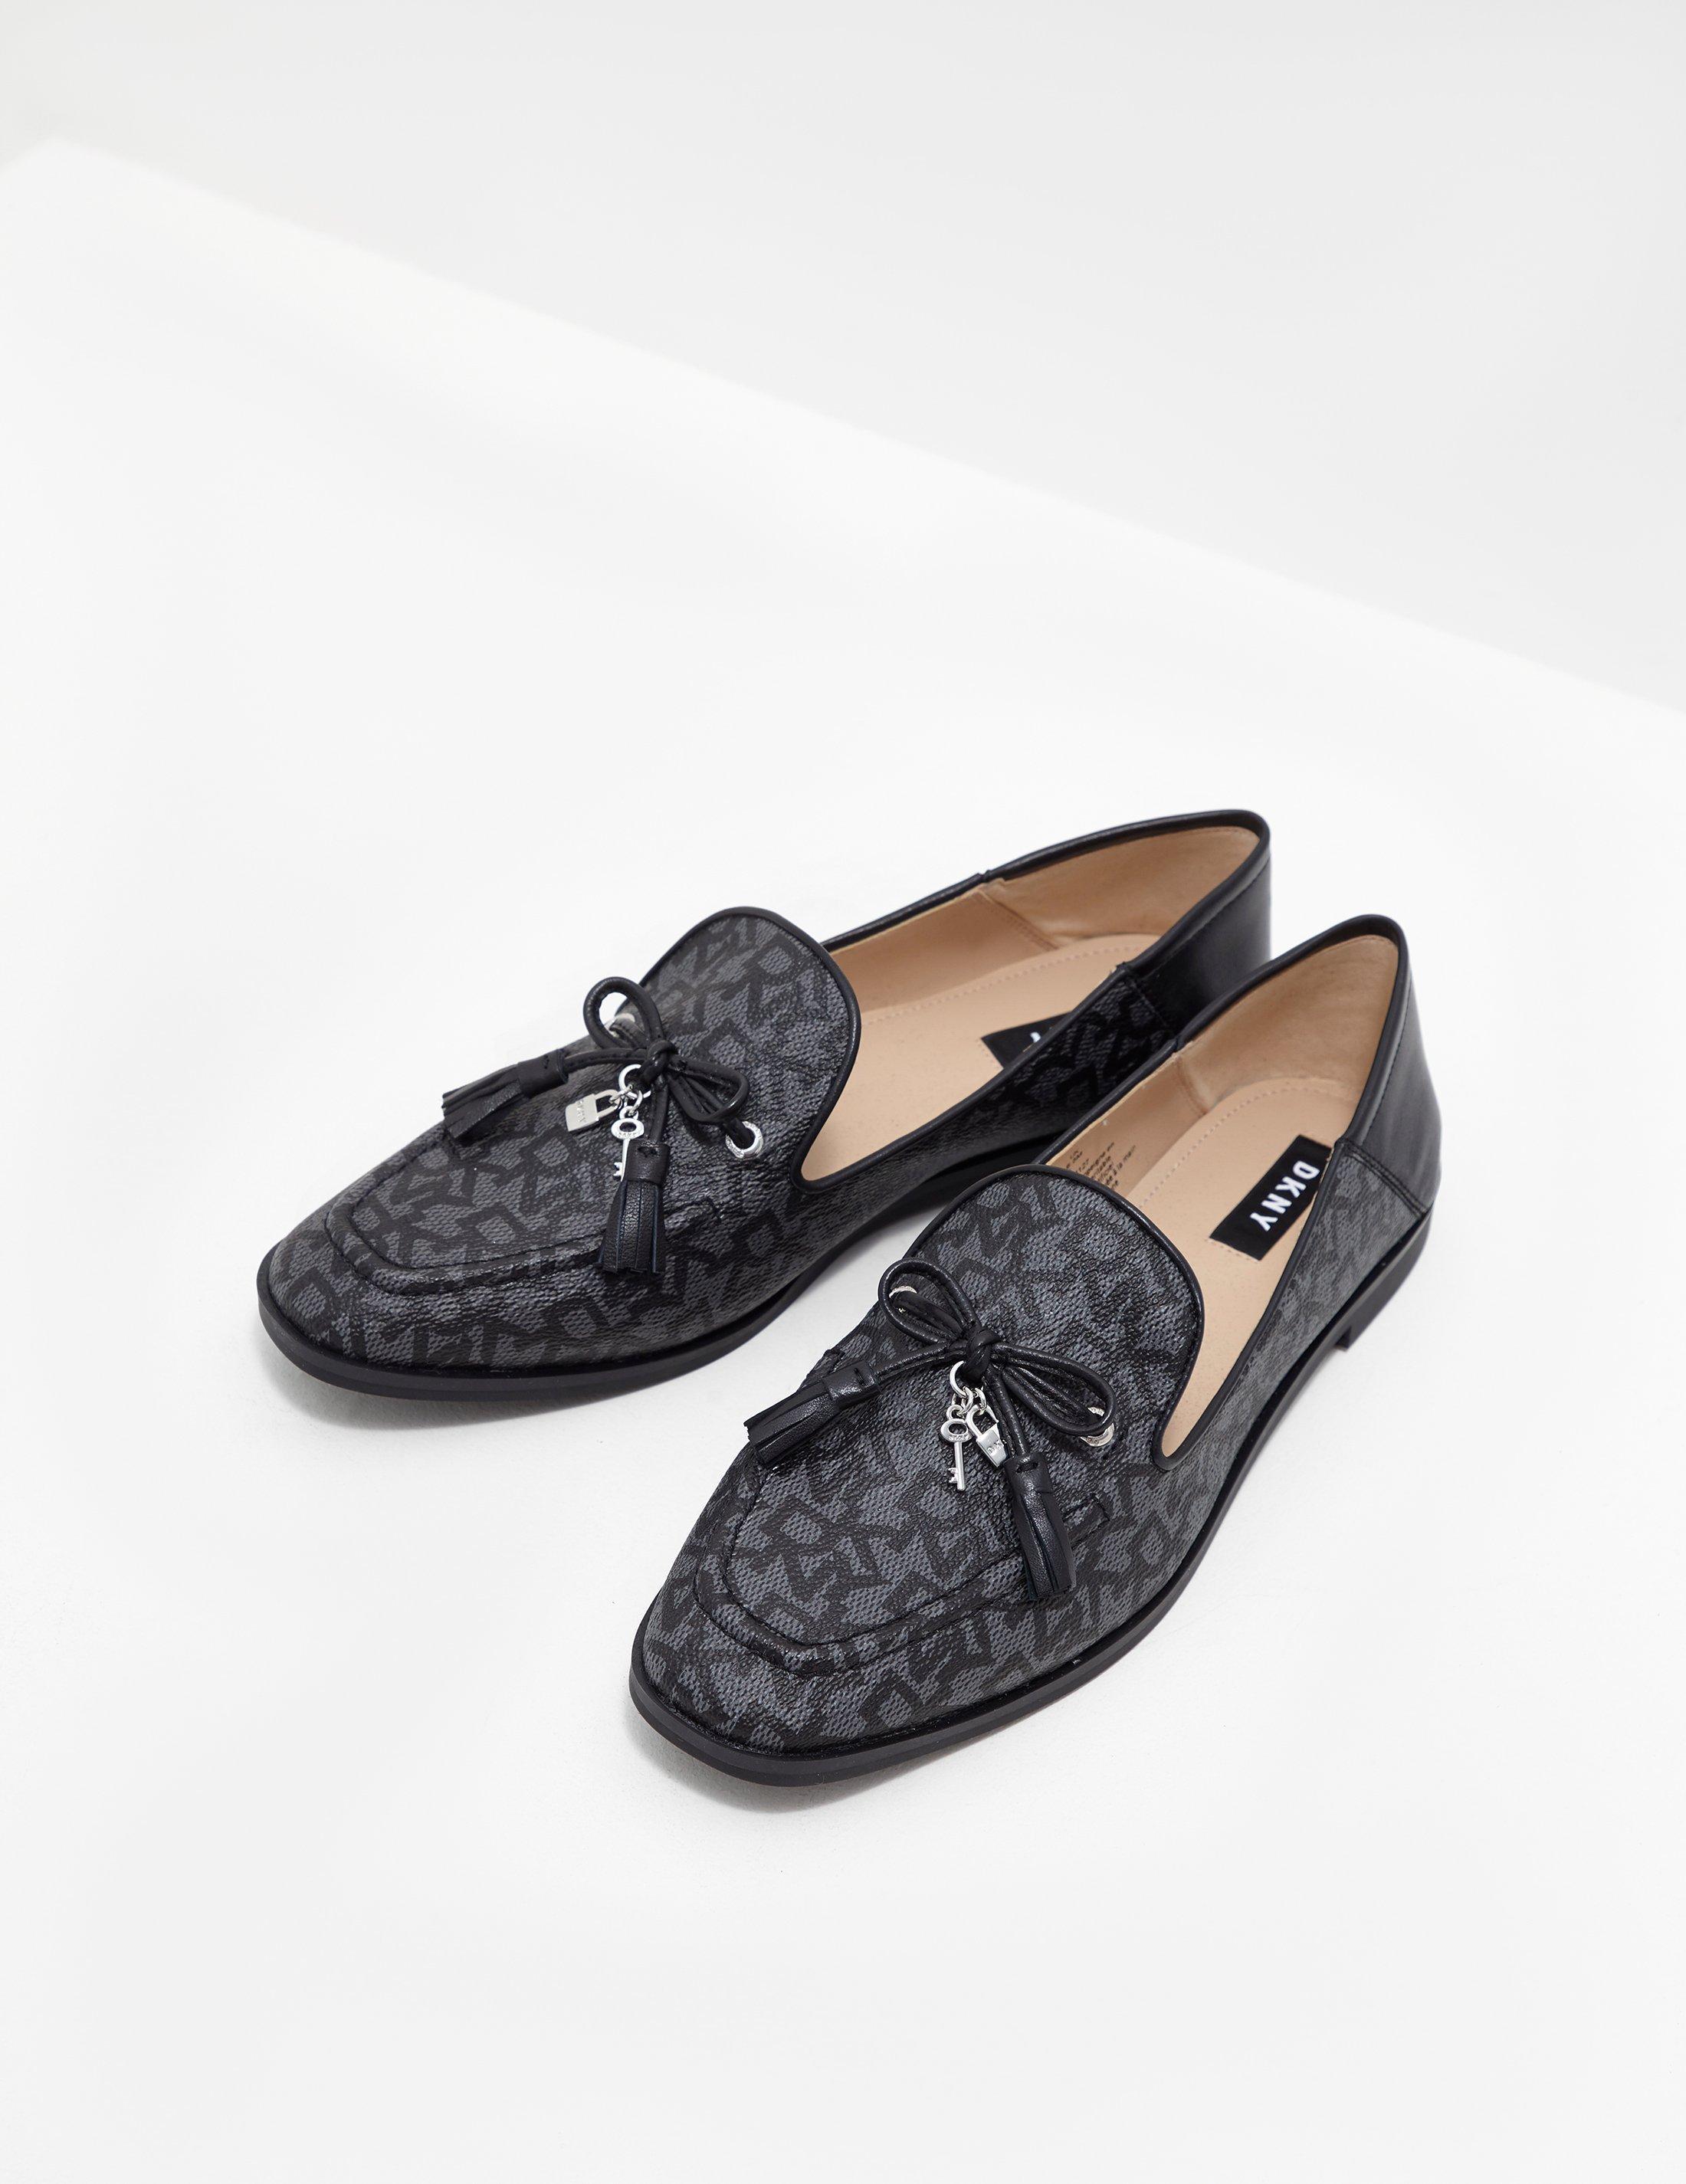 1db81e9f370 Lyst - DKNY Laura Slip On Flats - Online Exclusive Black in Black